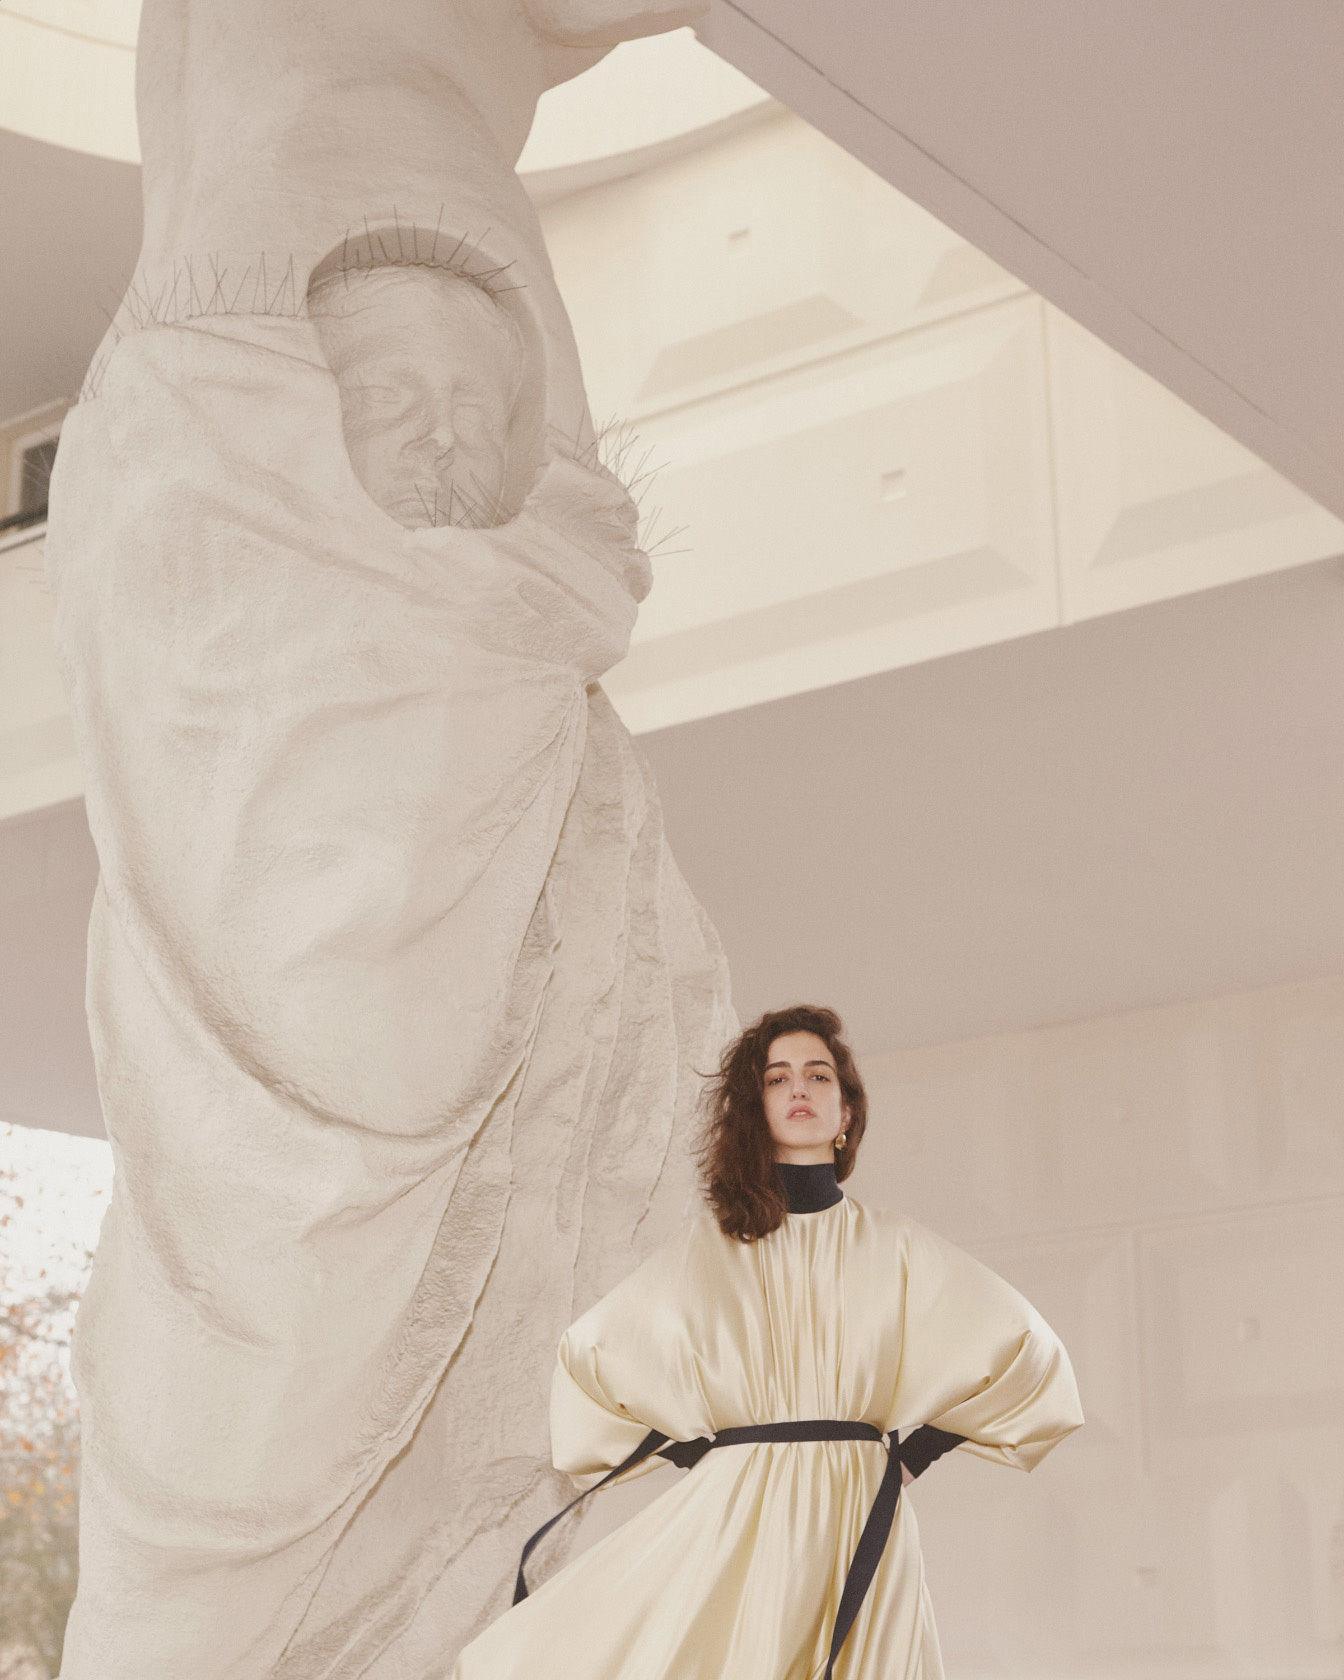 Sascha Heintze c/o FREDA+WOOLF for Bon Magazine